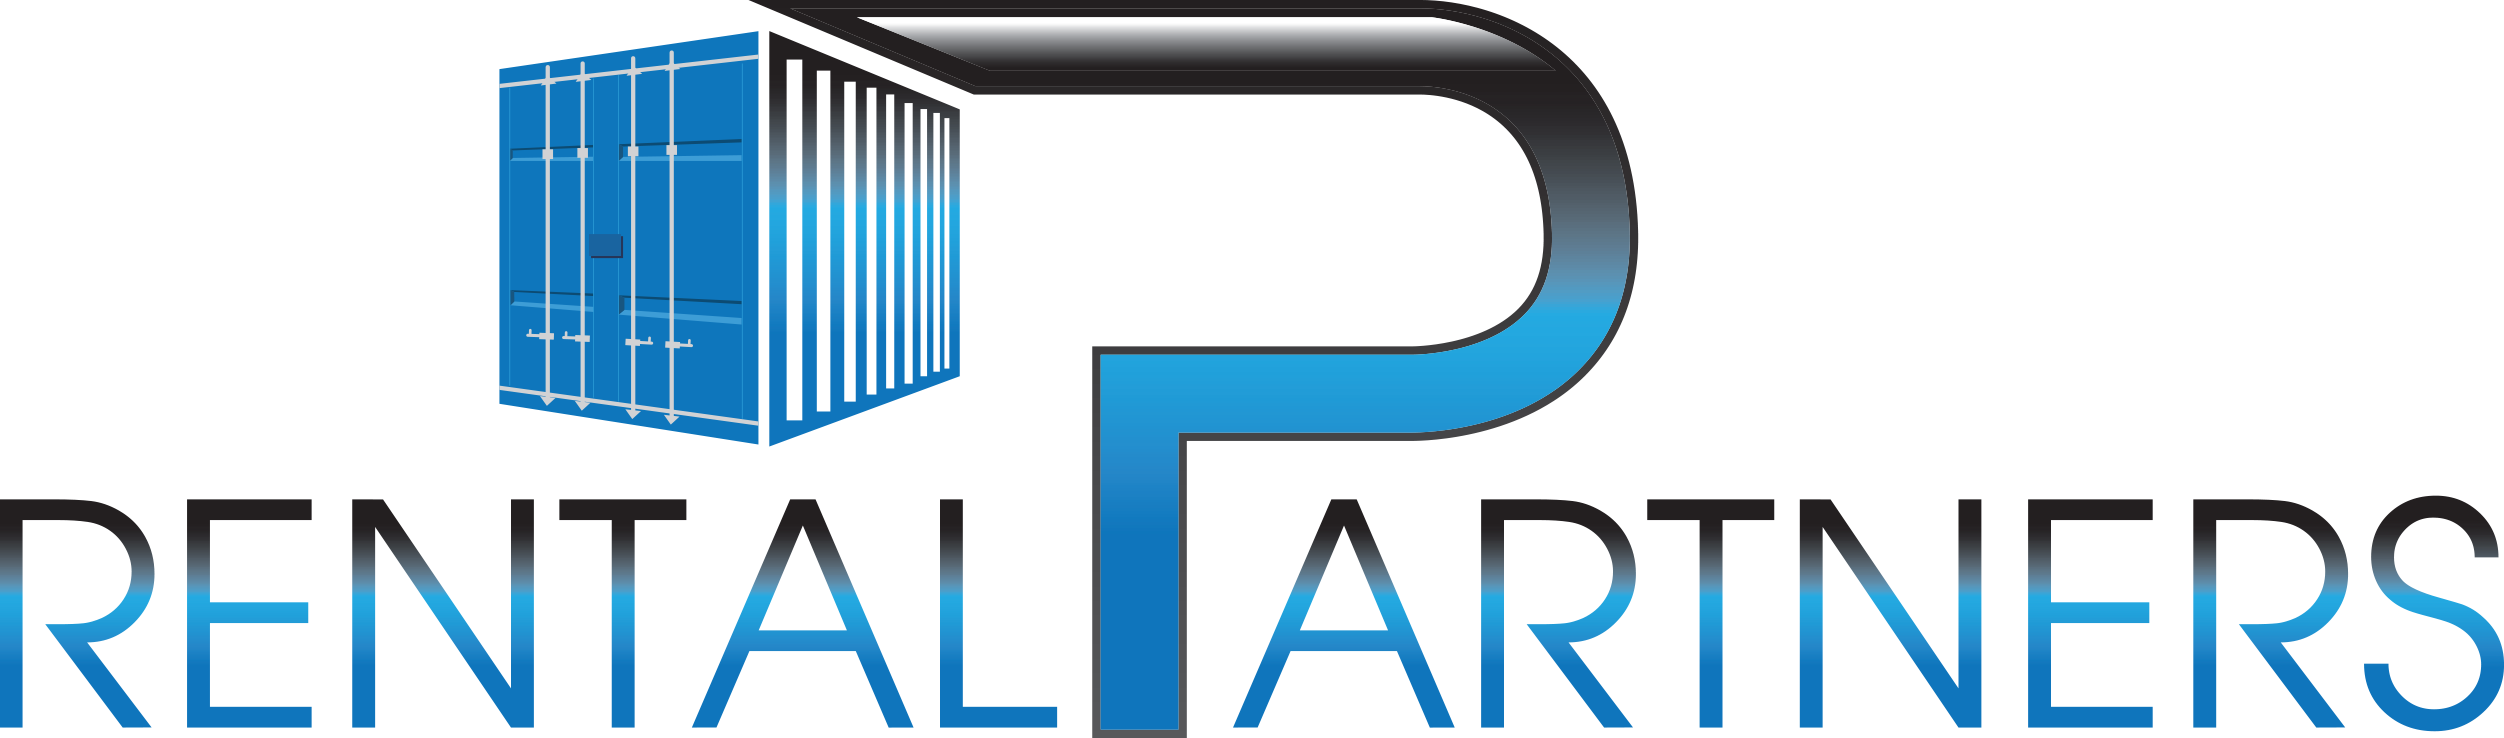 Rental Partners Logo